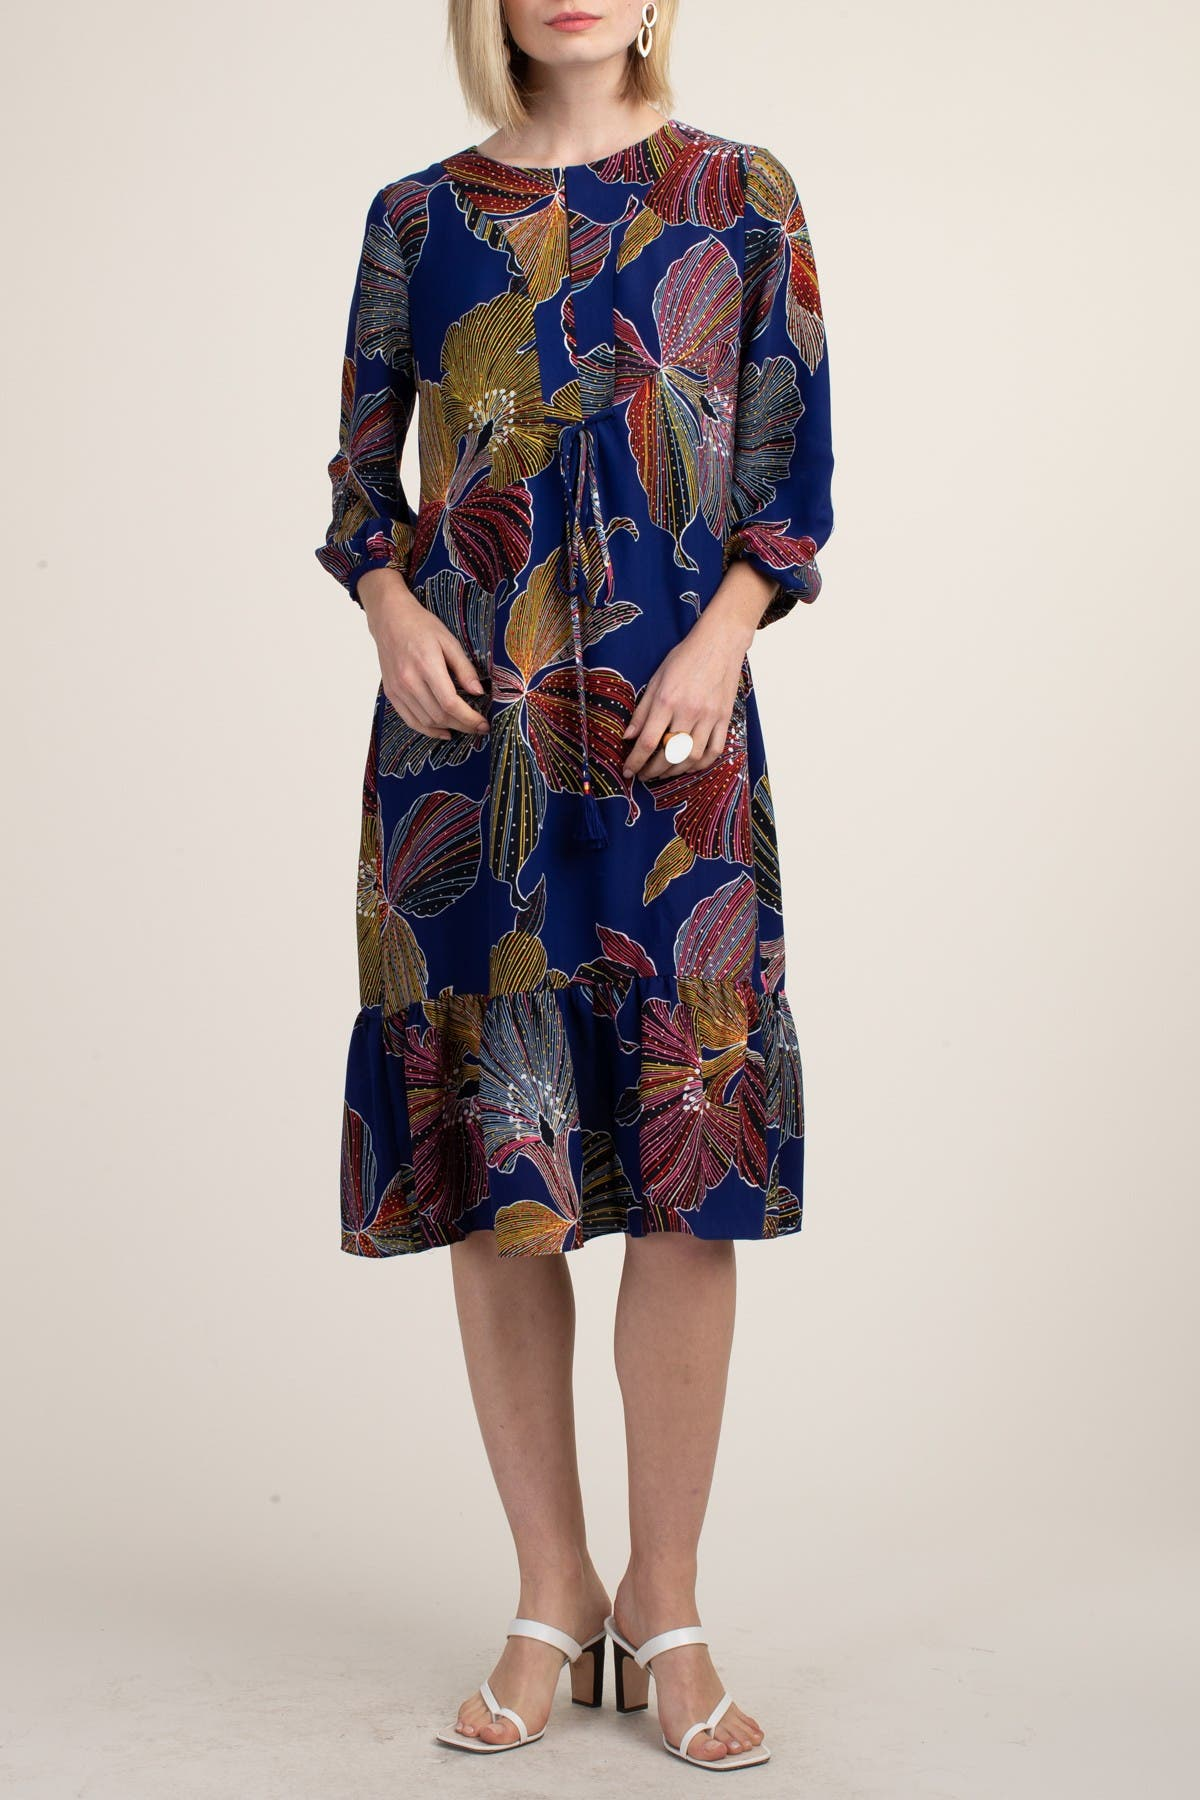 Image of Trina Turk Inspiring Dress